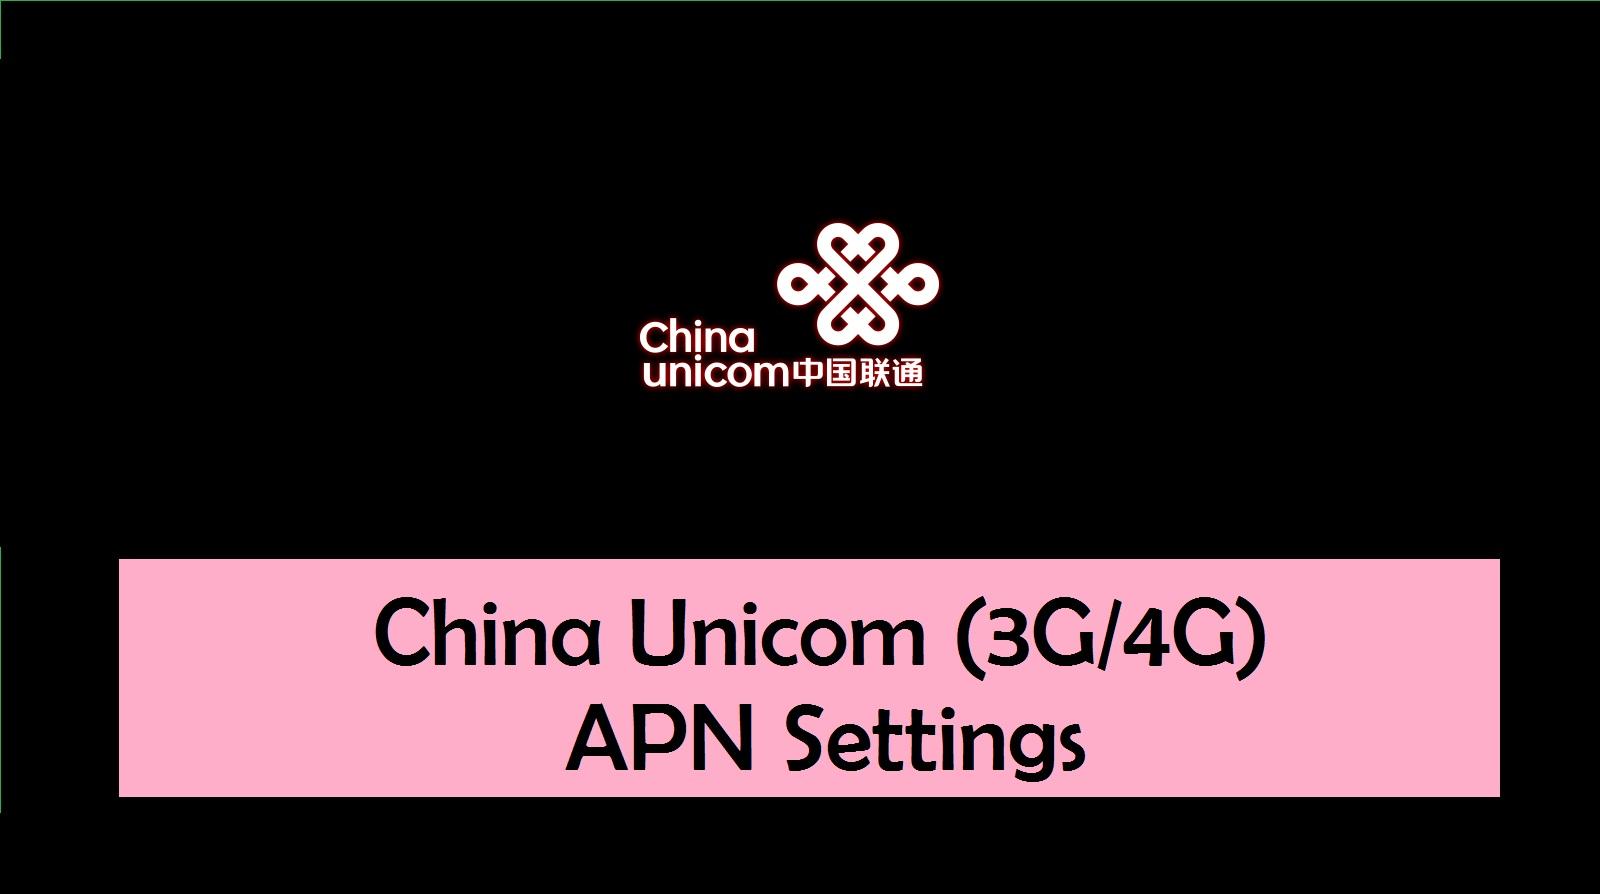 China Unicom (3G/4G) APN Settings